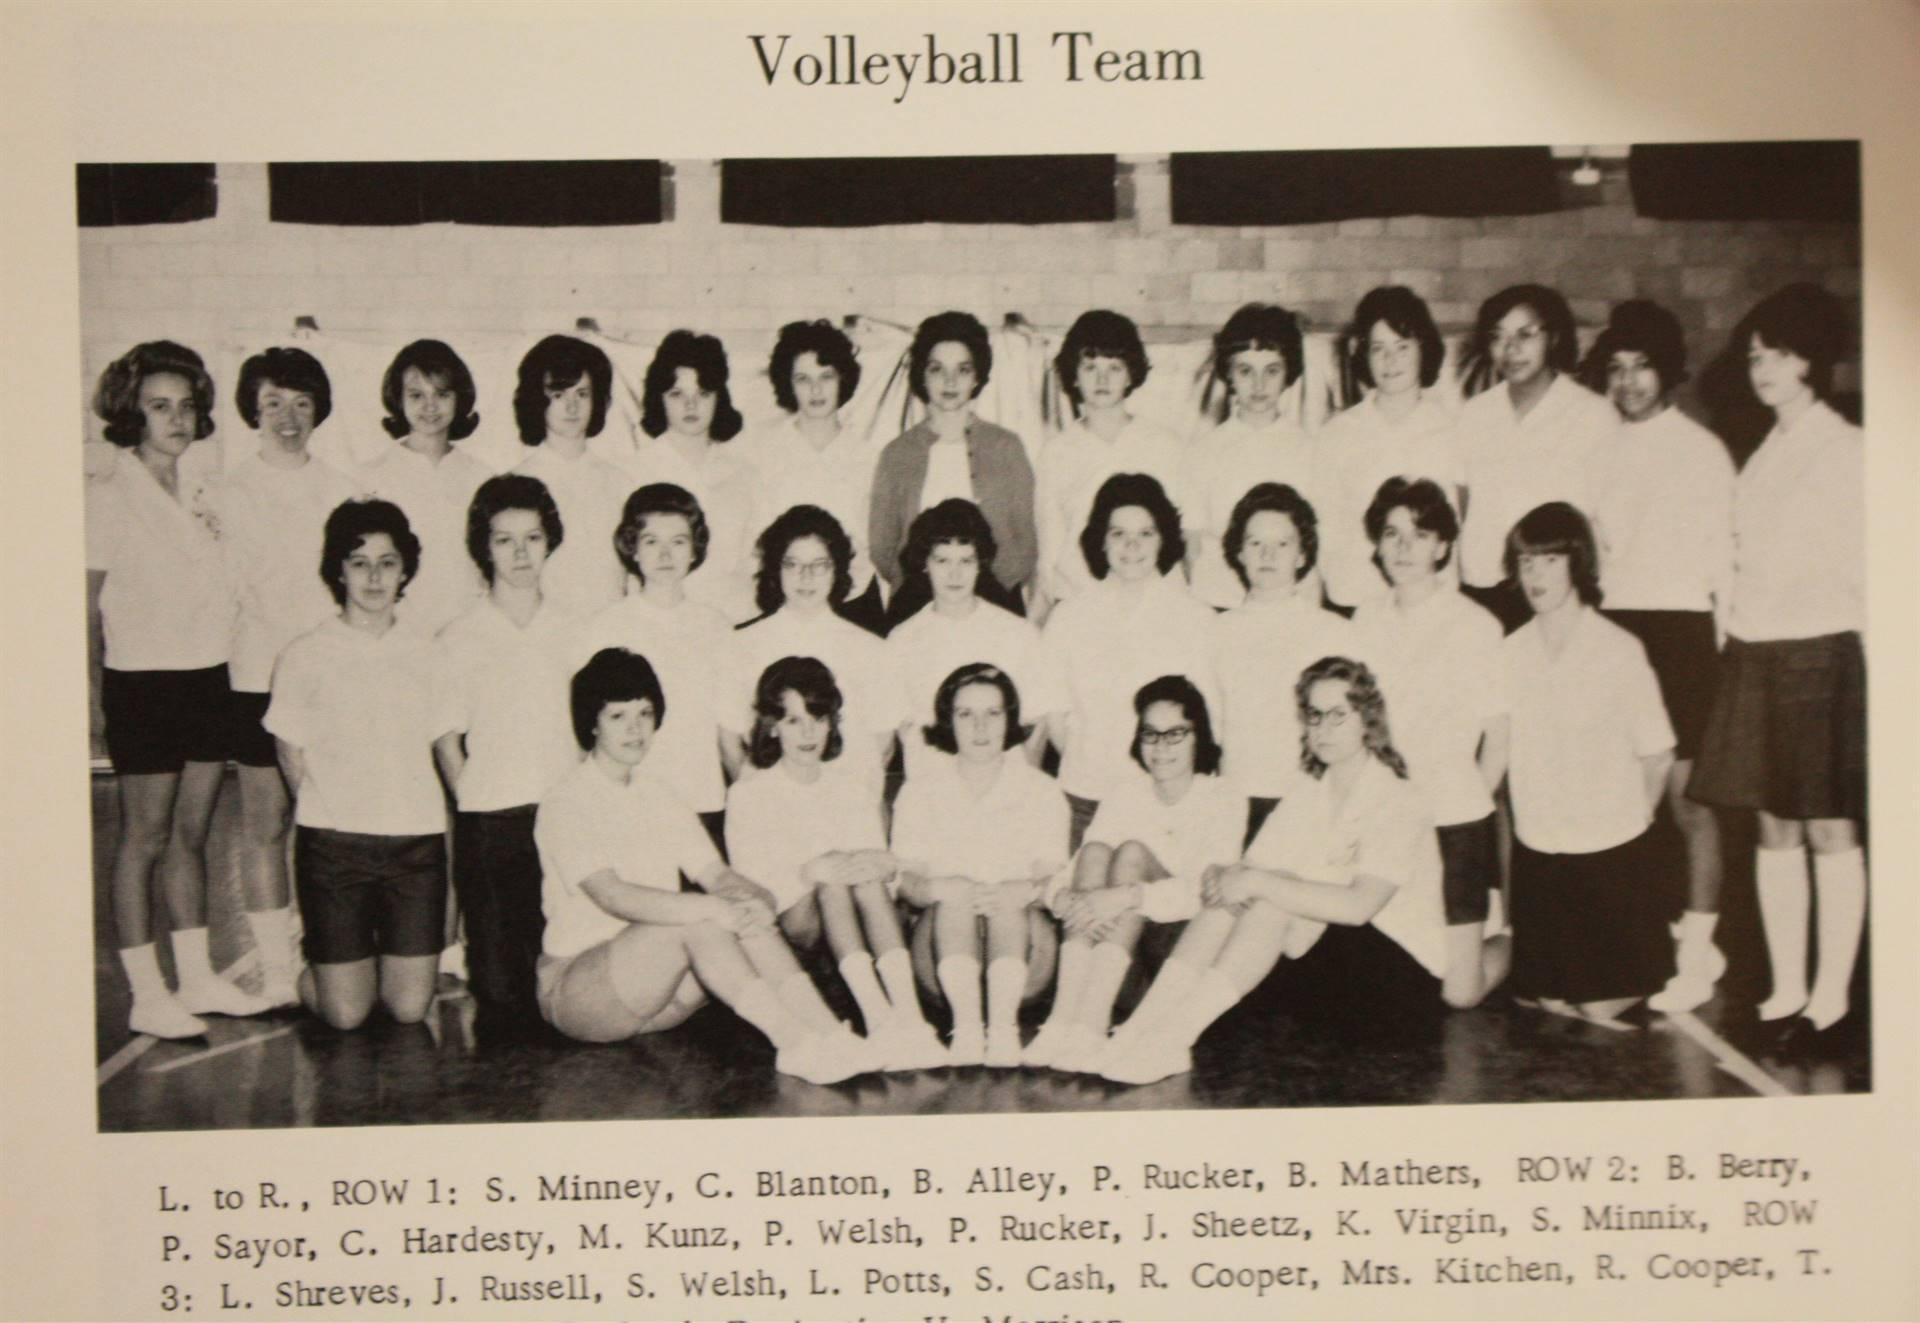 1965 volleyball team